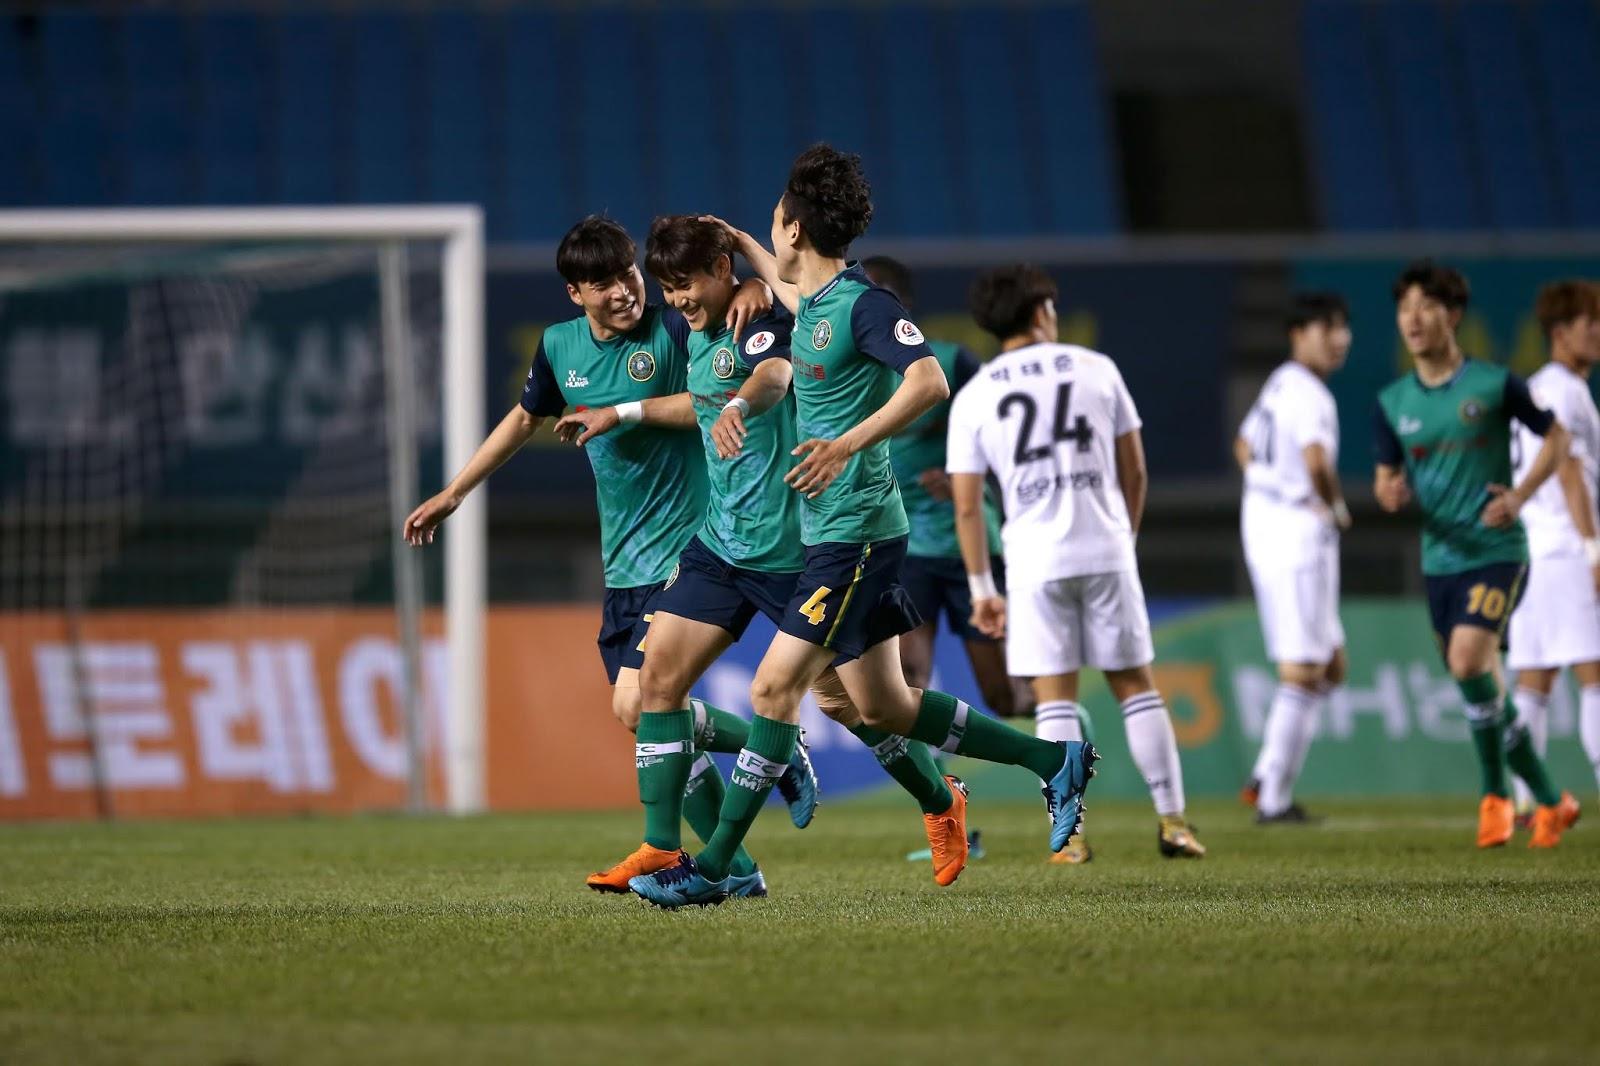 K League 1 Preview: Ansan Greeners vs Seongnam FC